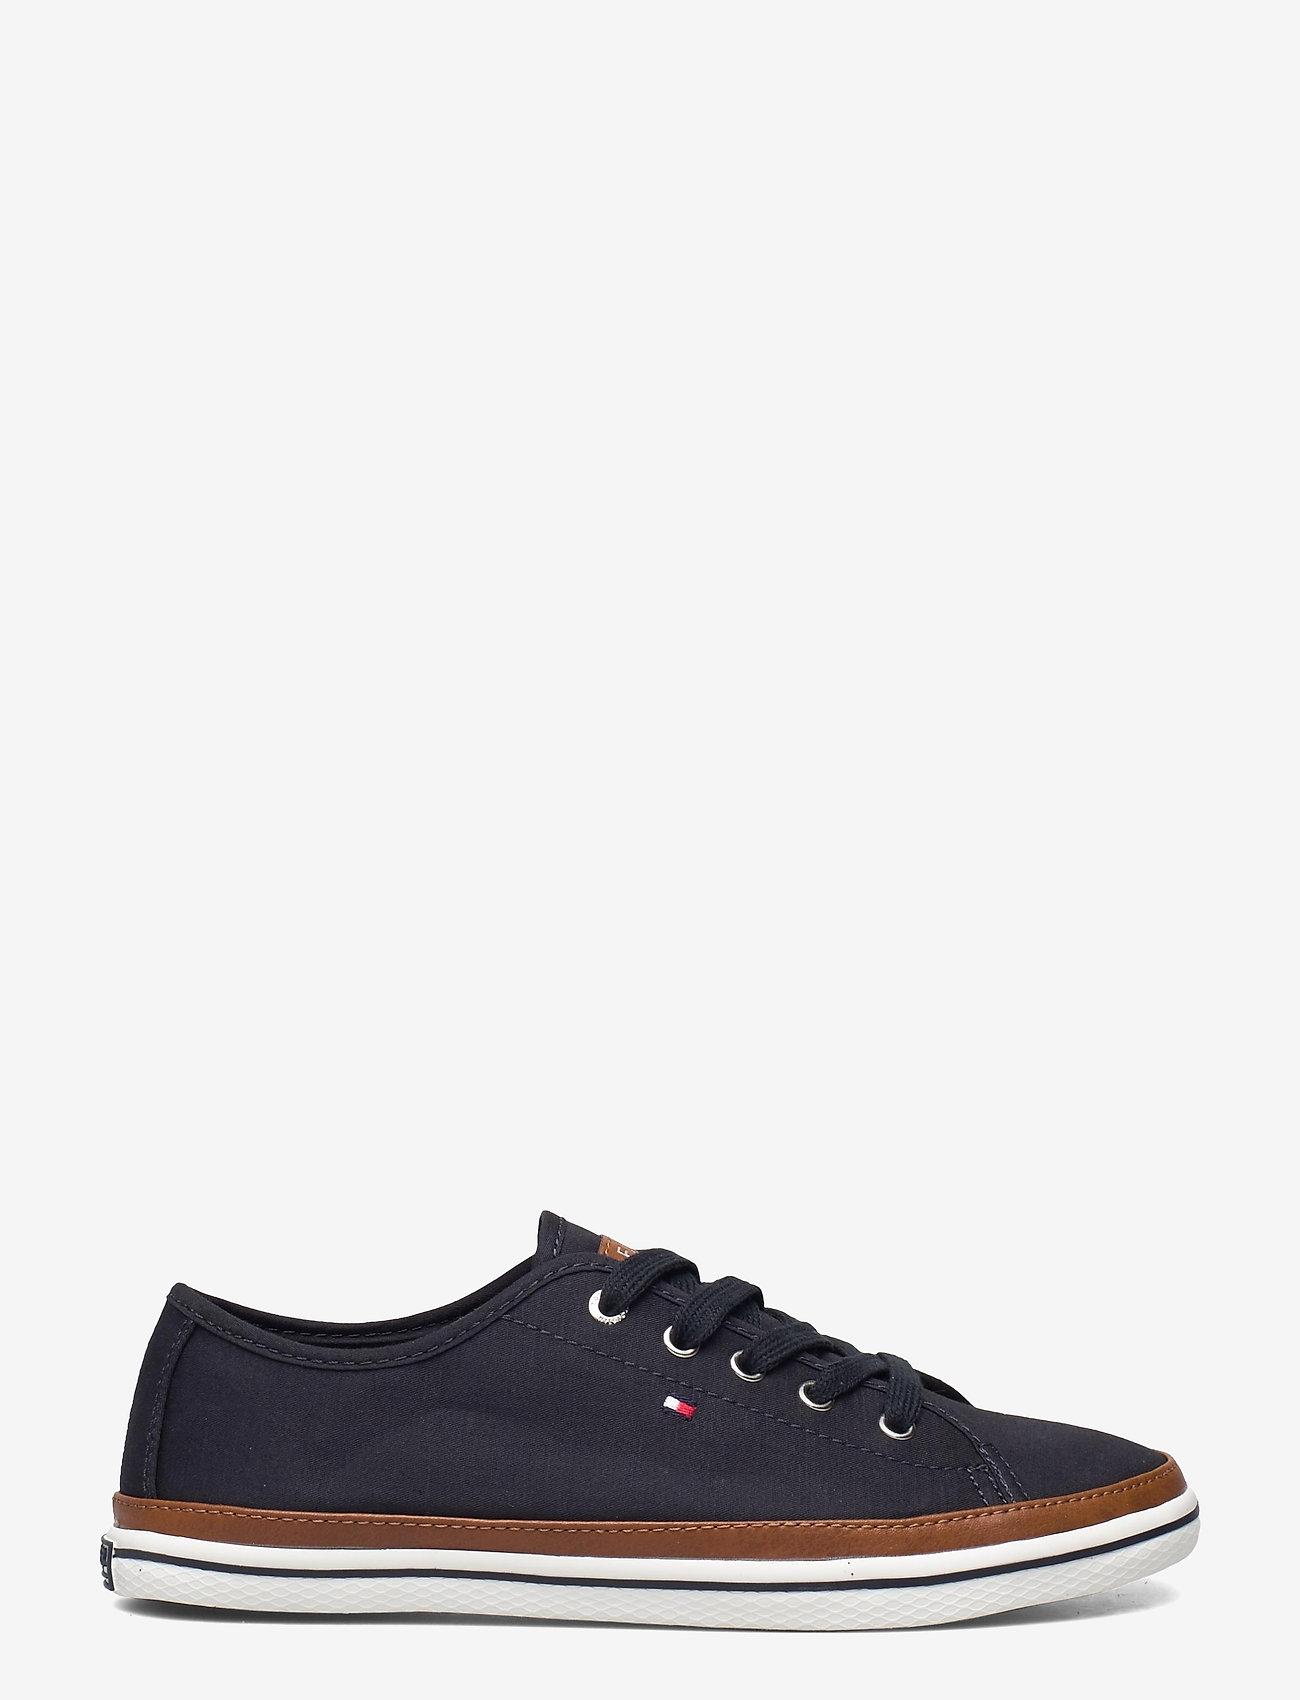 Tommy Hilfiger - K1285ESHA 6D - low top sneakers - midnight - 1